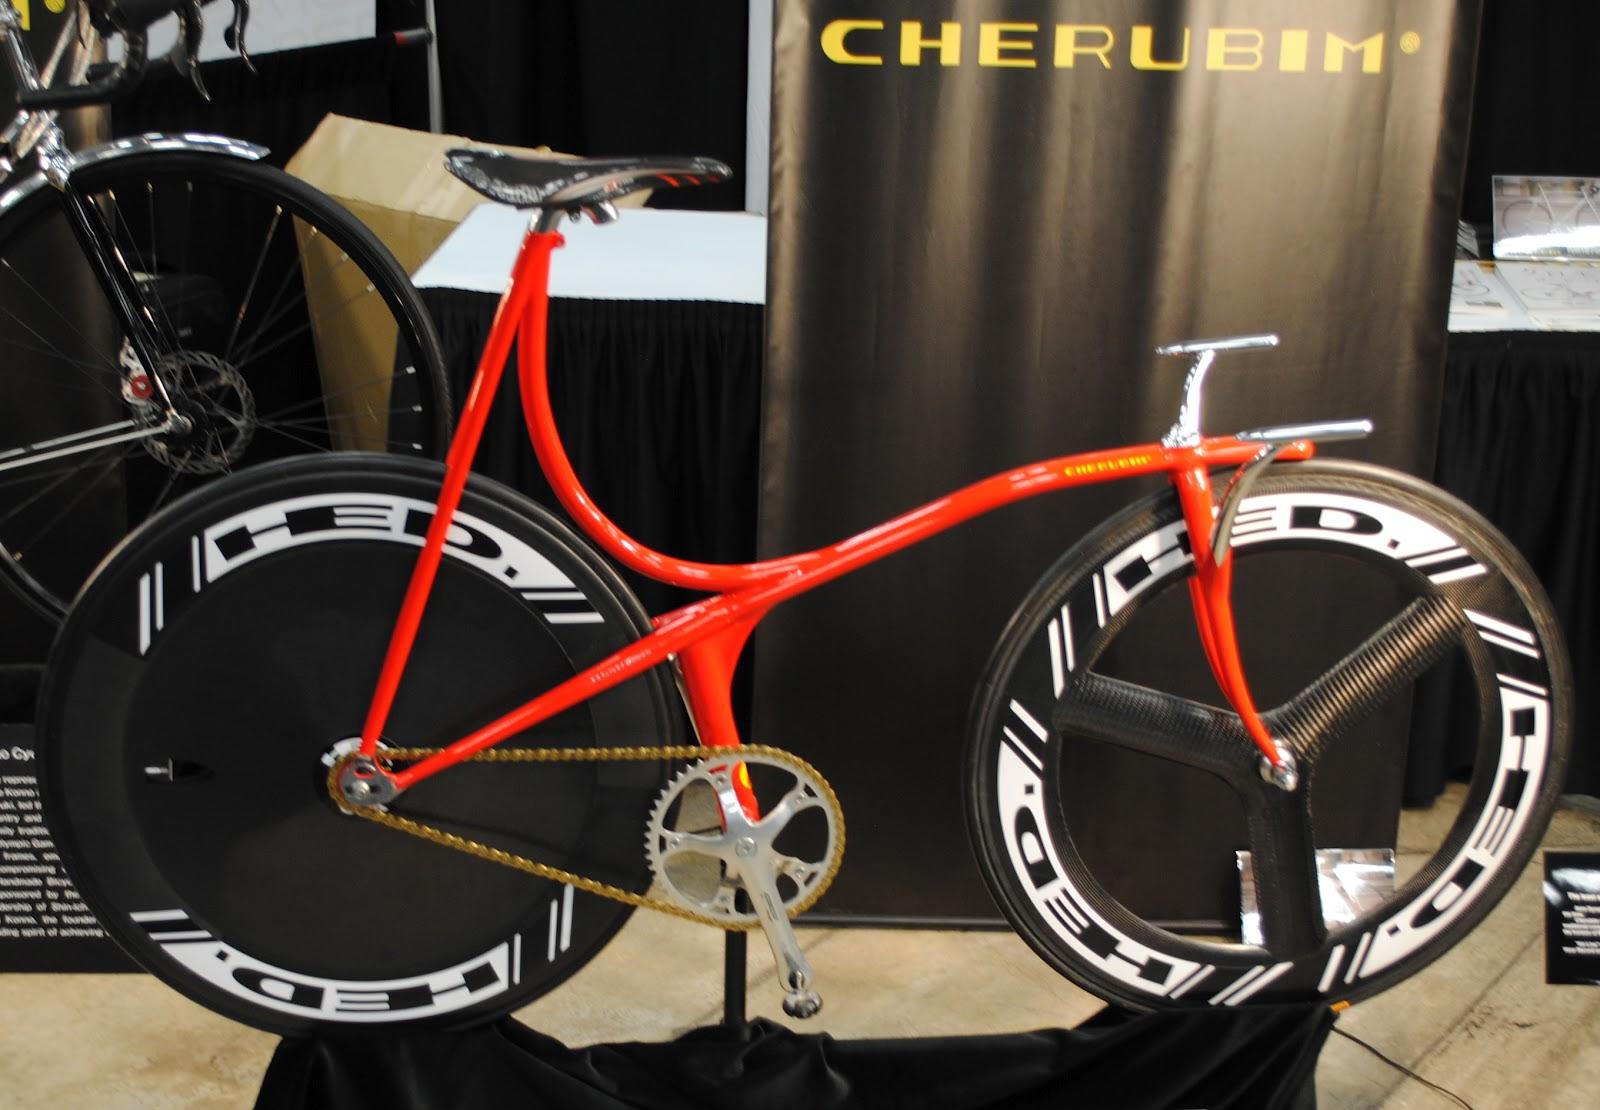 Lo Pro Cycling Club Cherubim Cycles Japan